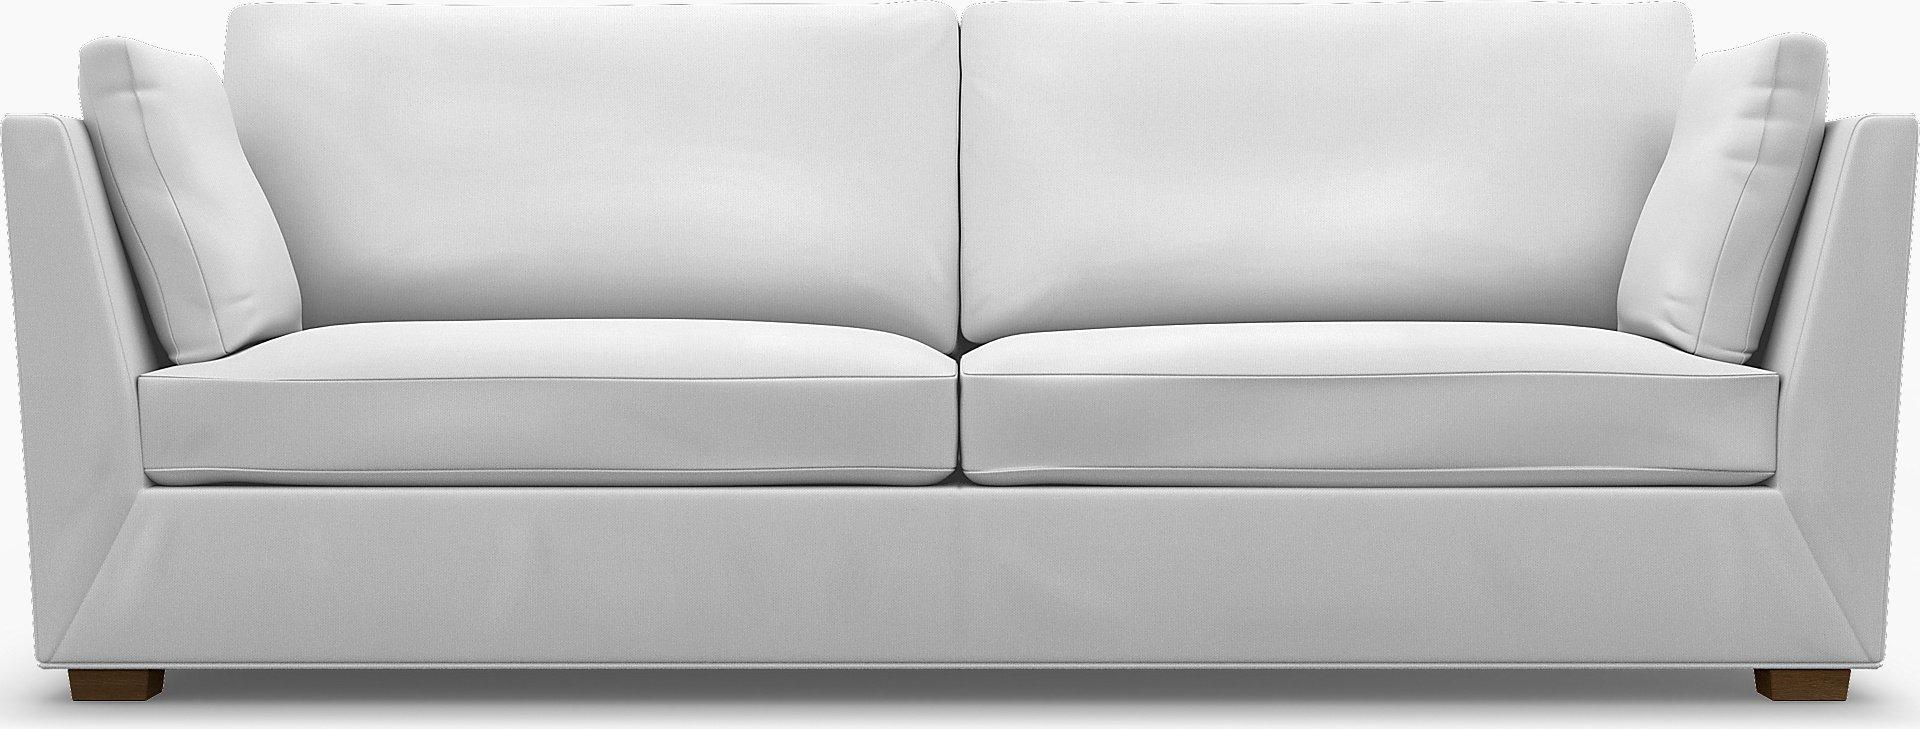 Full Size of Sofa Abnehmbarer Bezug Ikea Big Waschbarer Modulares Mit Abnehmbarem Hussen Fr 3 Cognac Boxspring Sitzer Kinderzimmer Goodlife Petrol Hocker Antik Bunt Grau Sofa Sofa Abnehmbarer Bezug